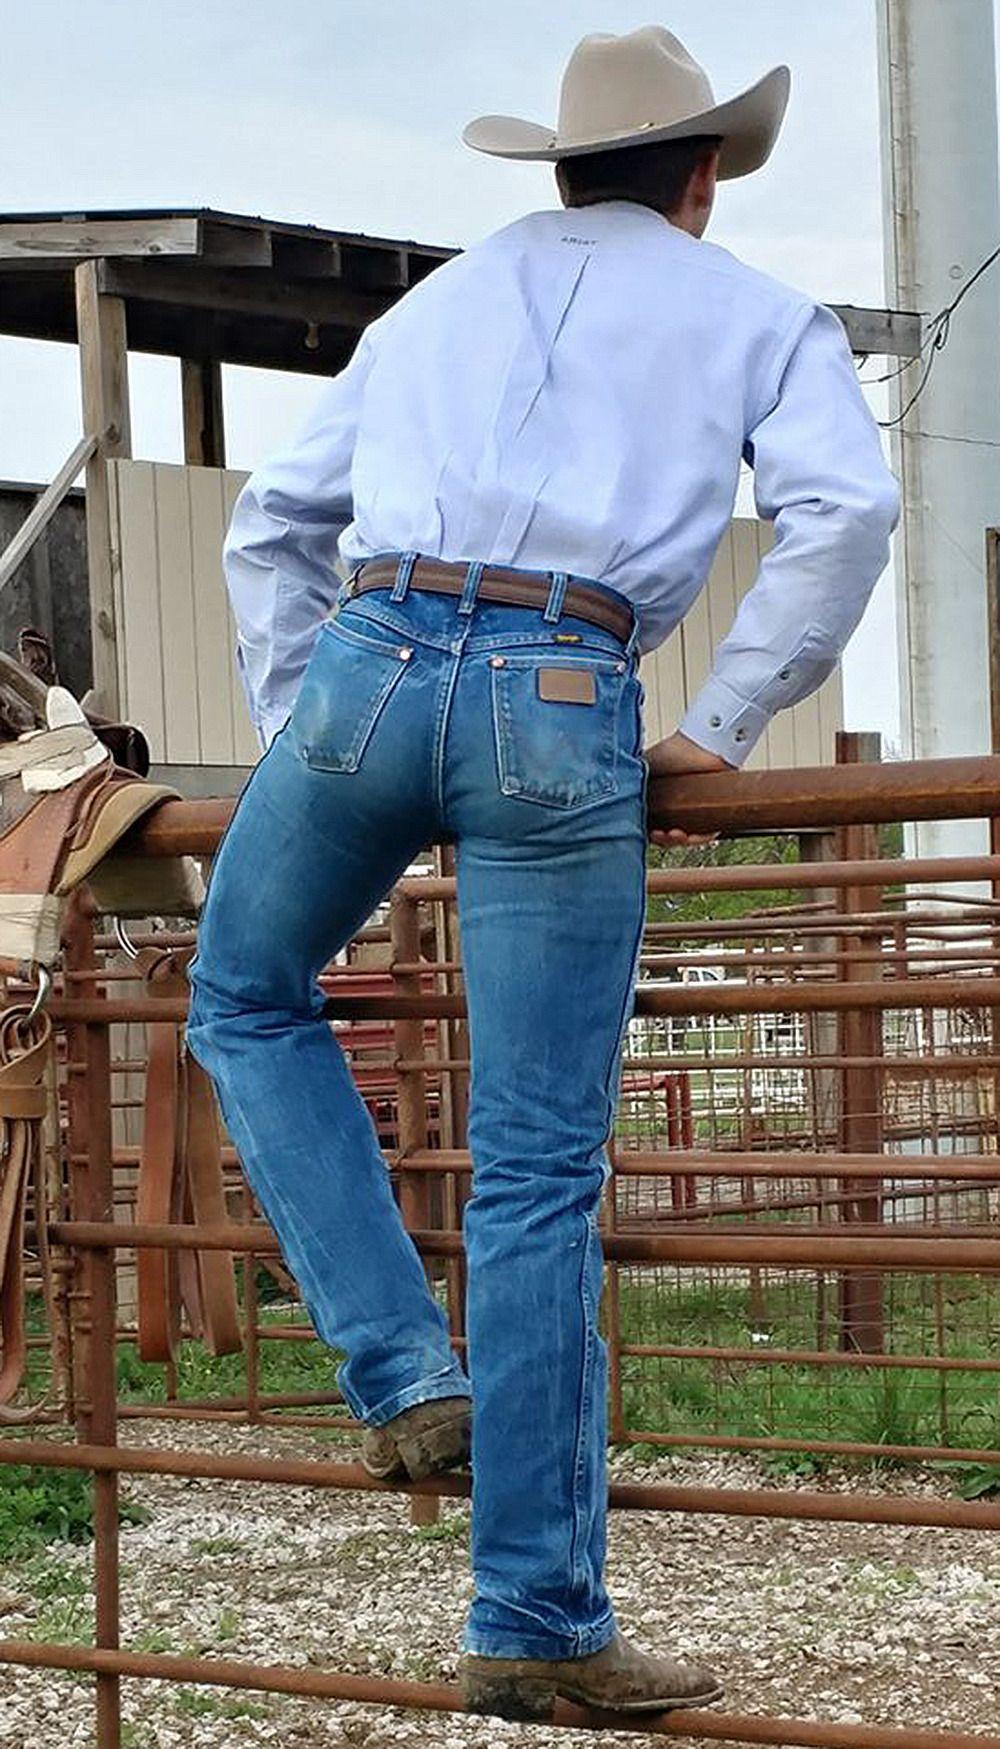 TIGHT JEANS STUDS   Tight jeans men